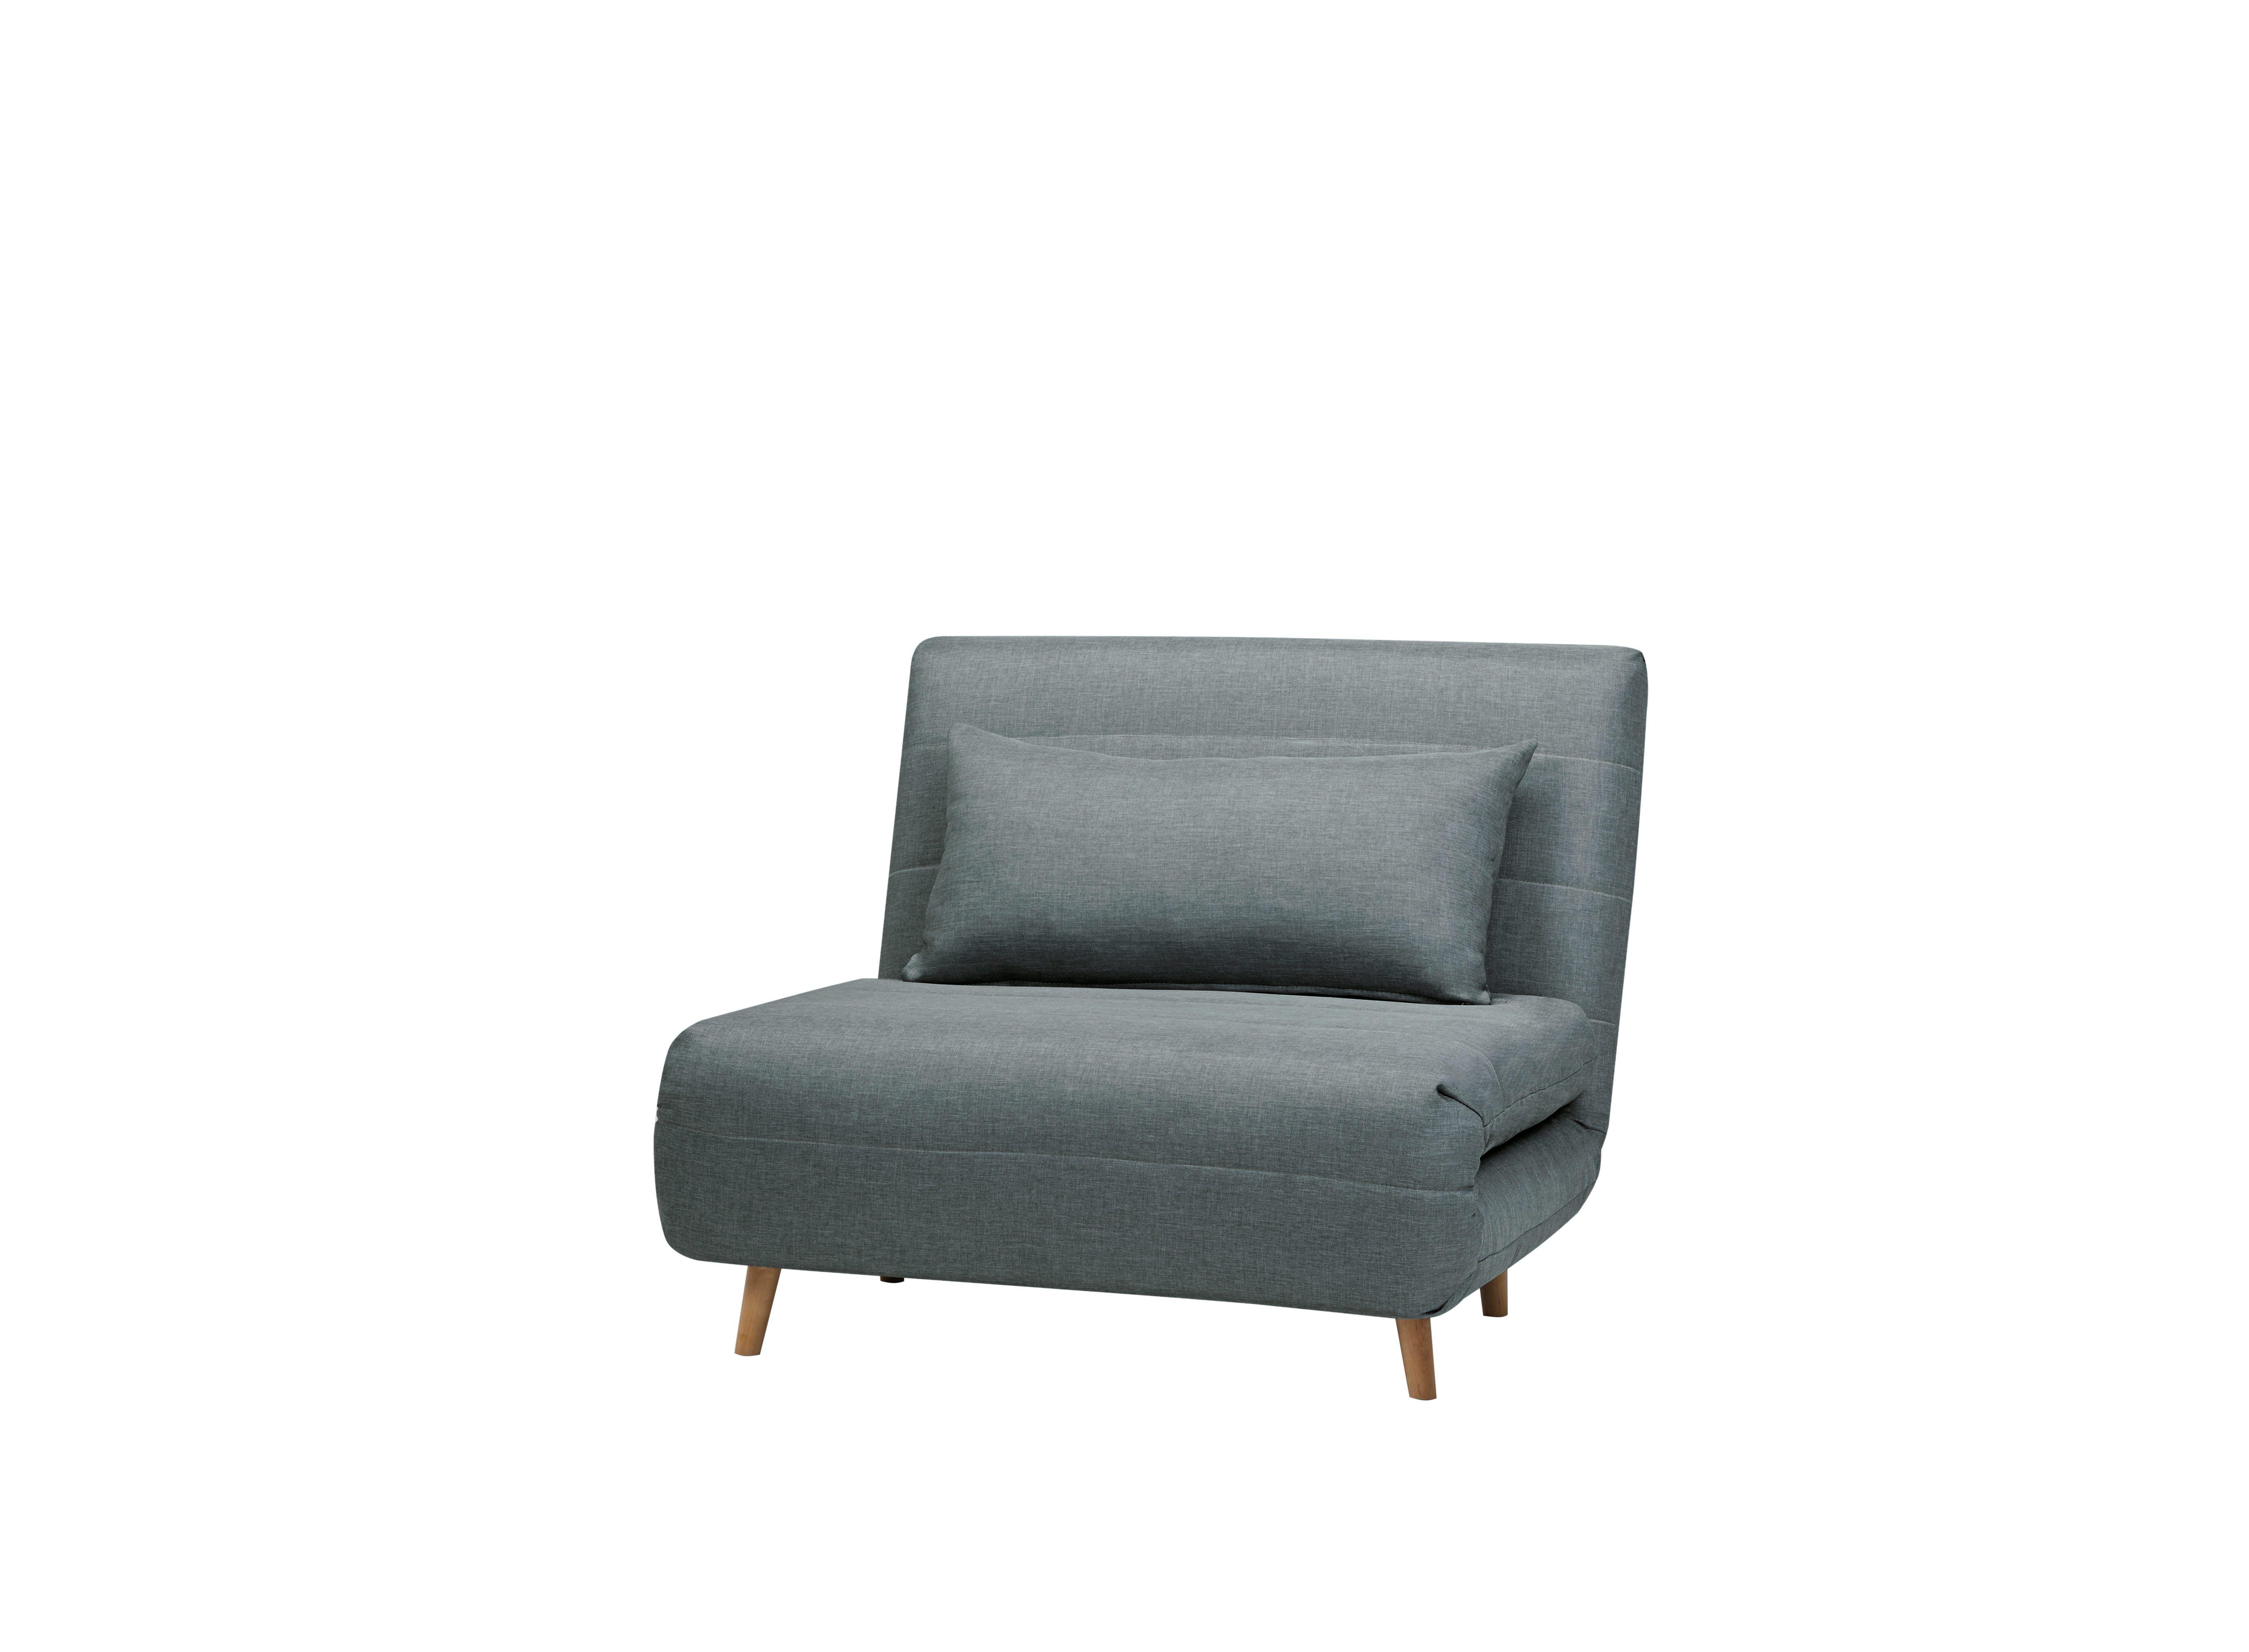 Fauteuil convertible tissu Gris/Bleu IGLOO | Inspiration au salon ...